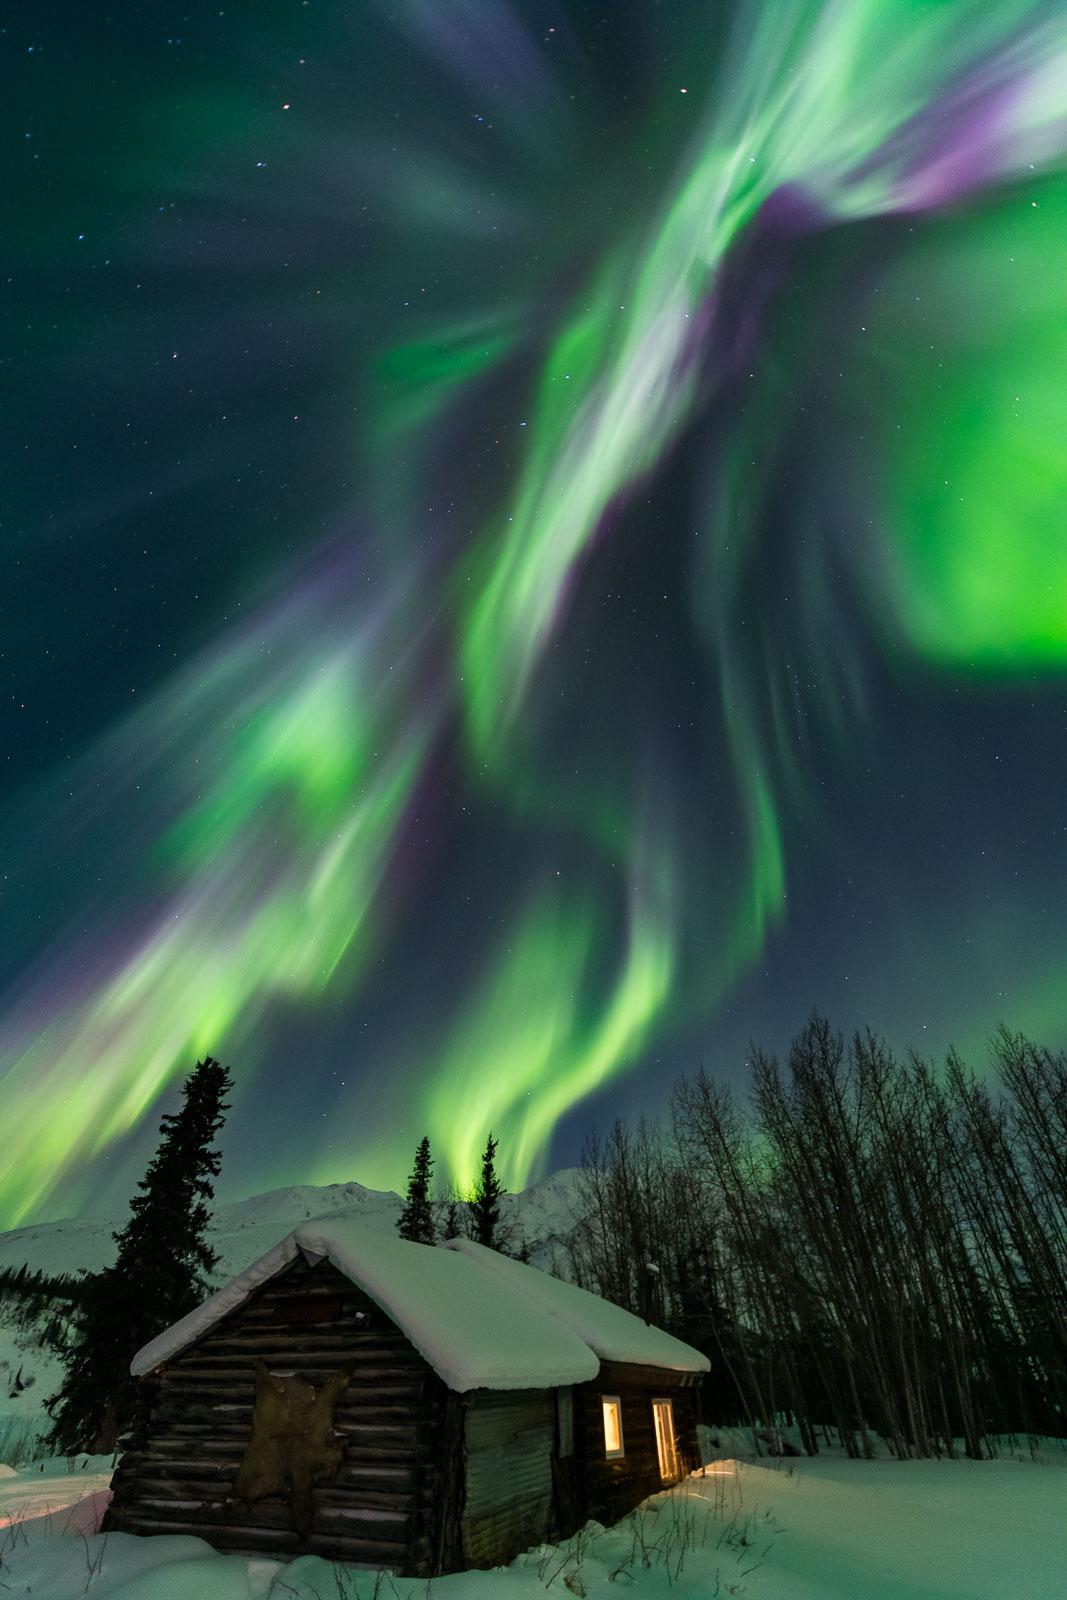 The aurora borealis soars over the Johnson cabin in Wiseman, Alaska.